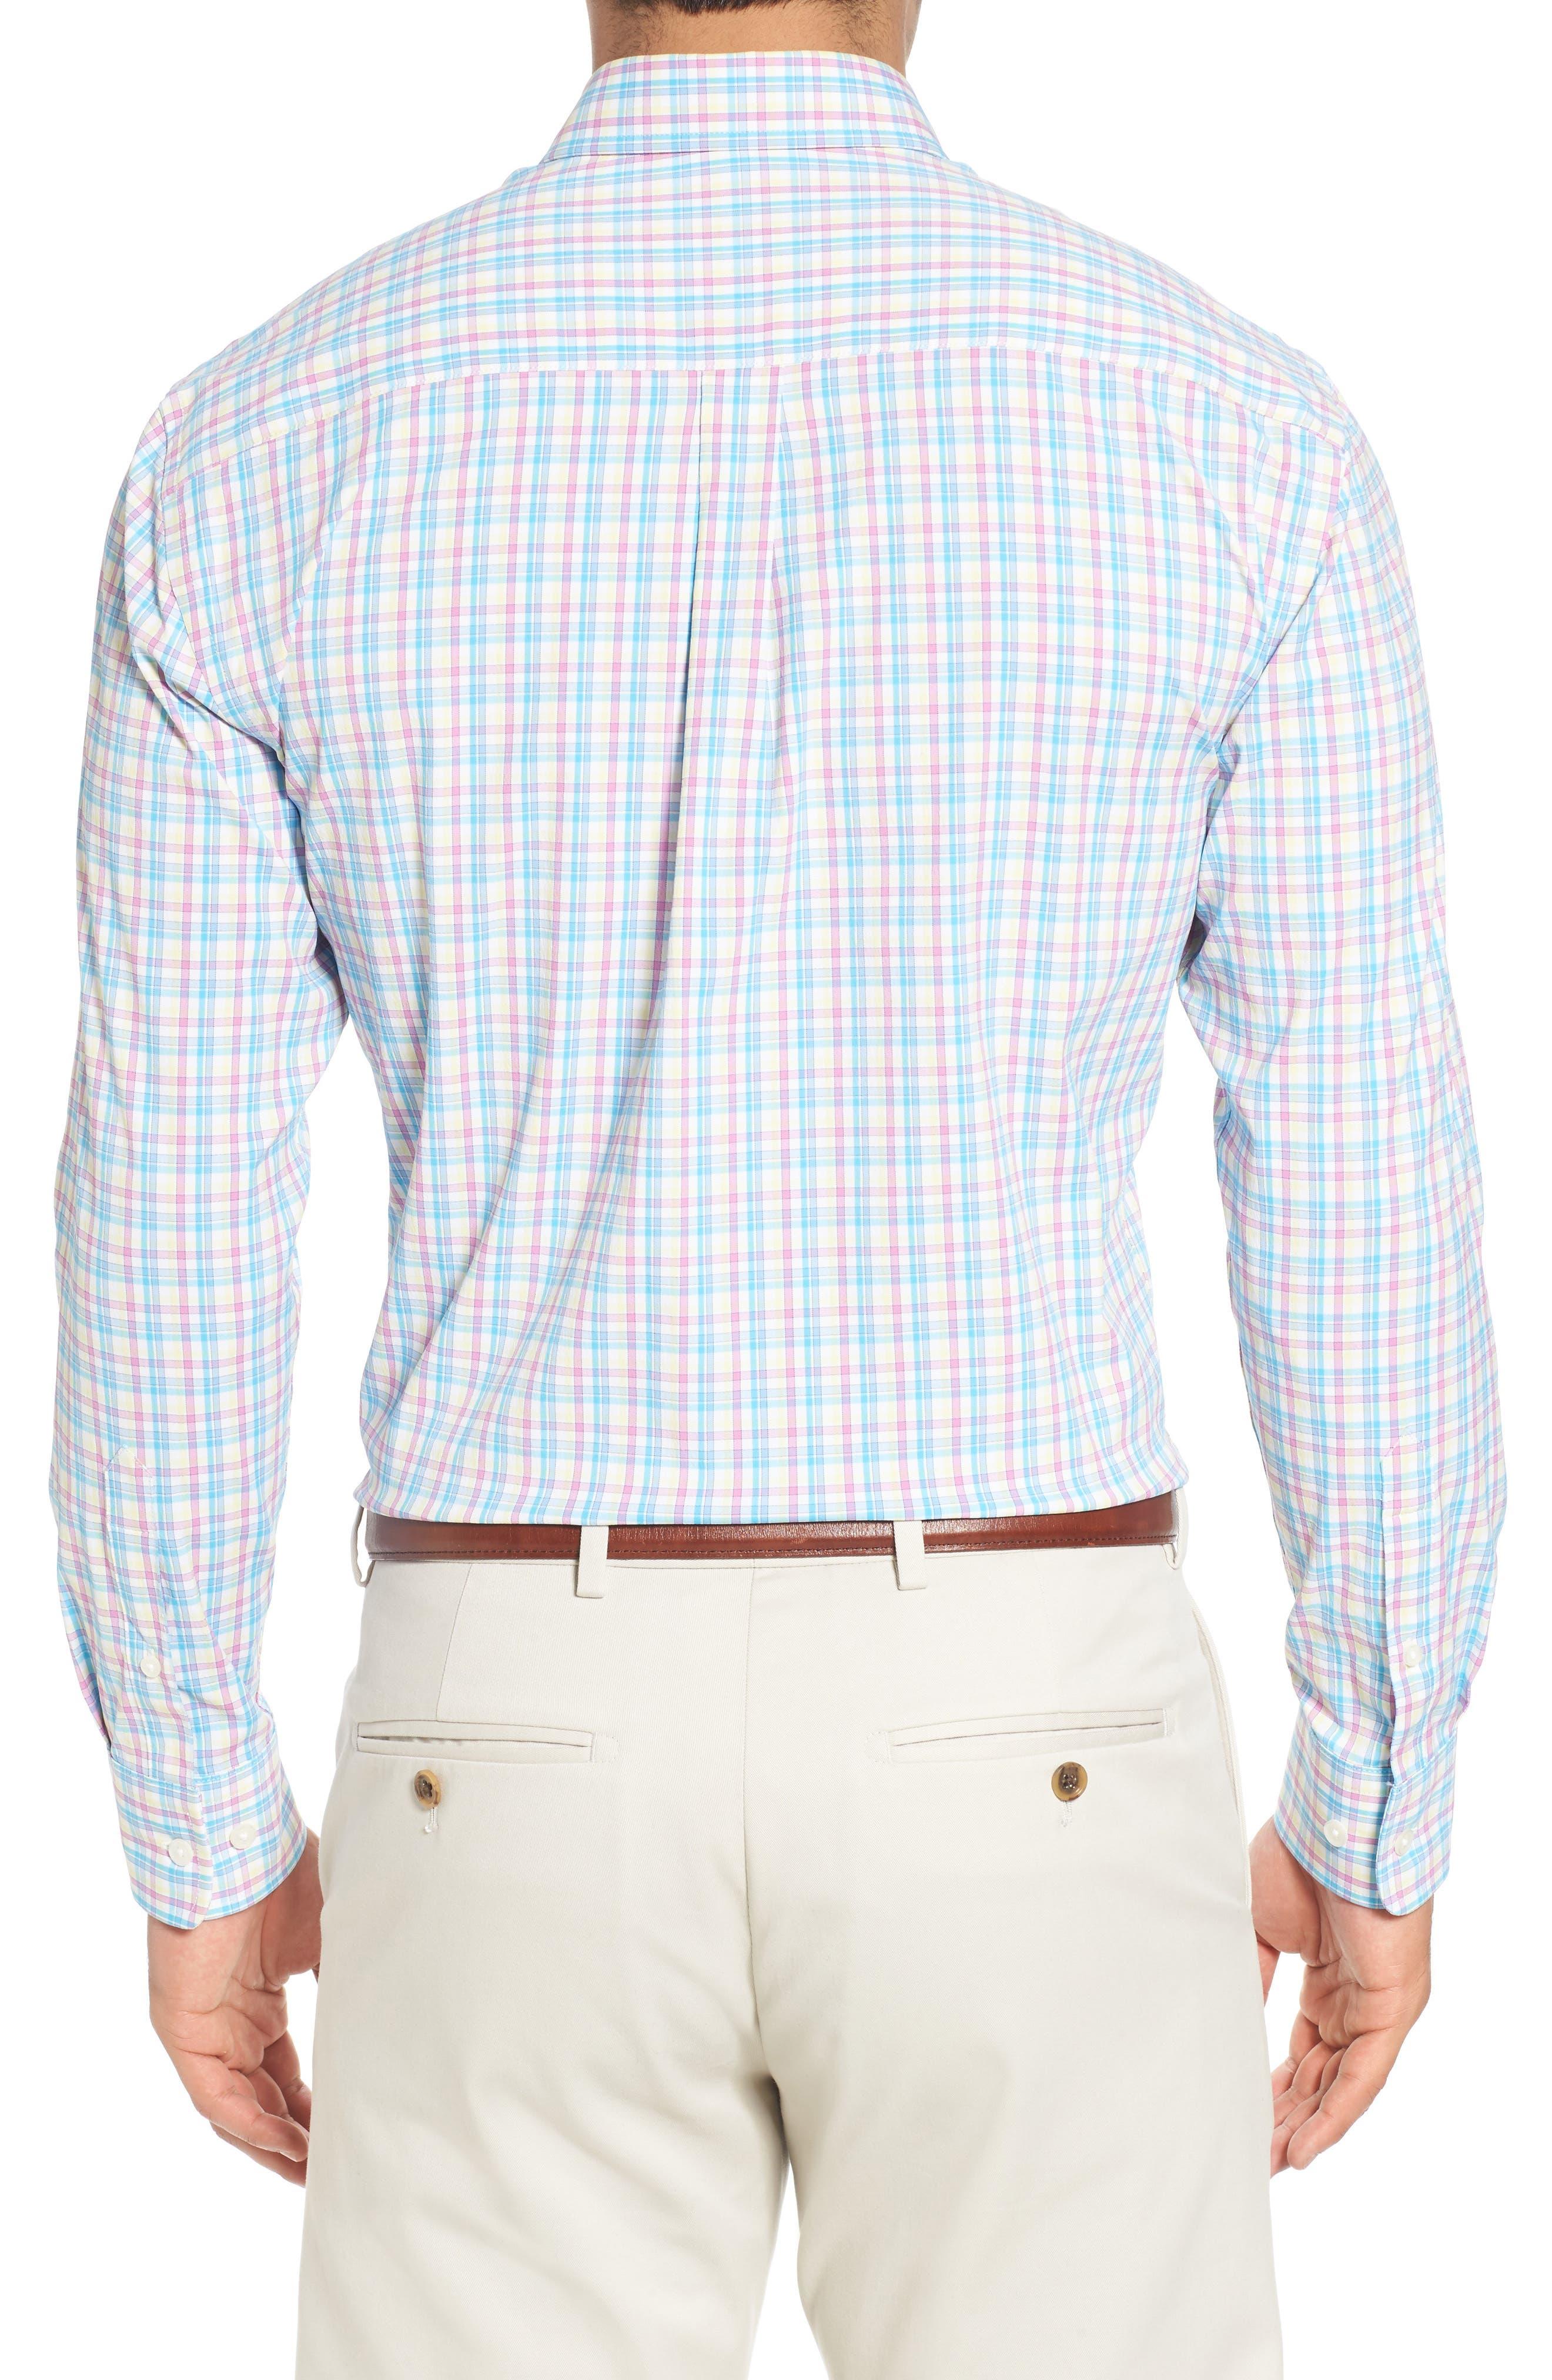 Dorian Plaid Easy Care Sport Shirt,                             Alternate thumbnail 2, color,                             White